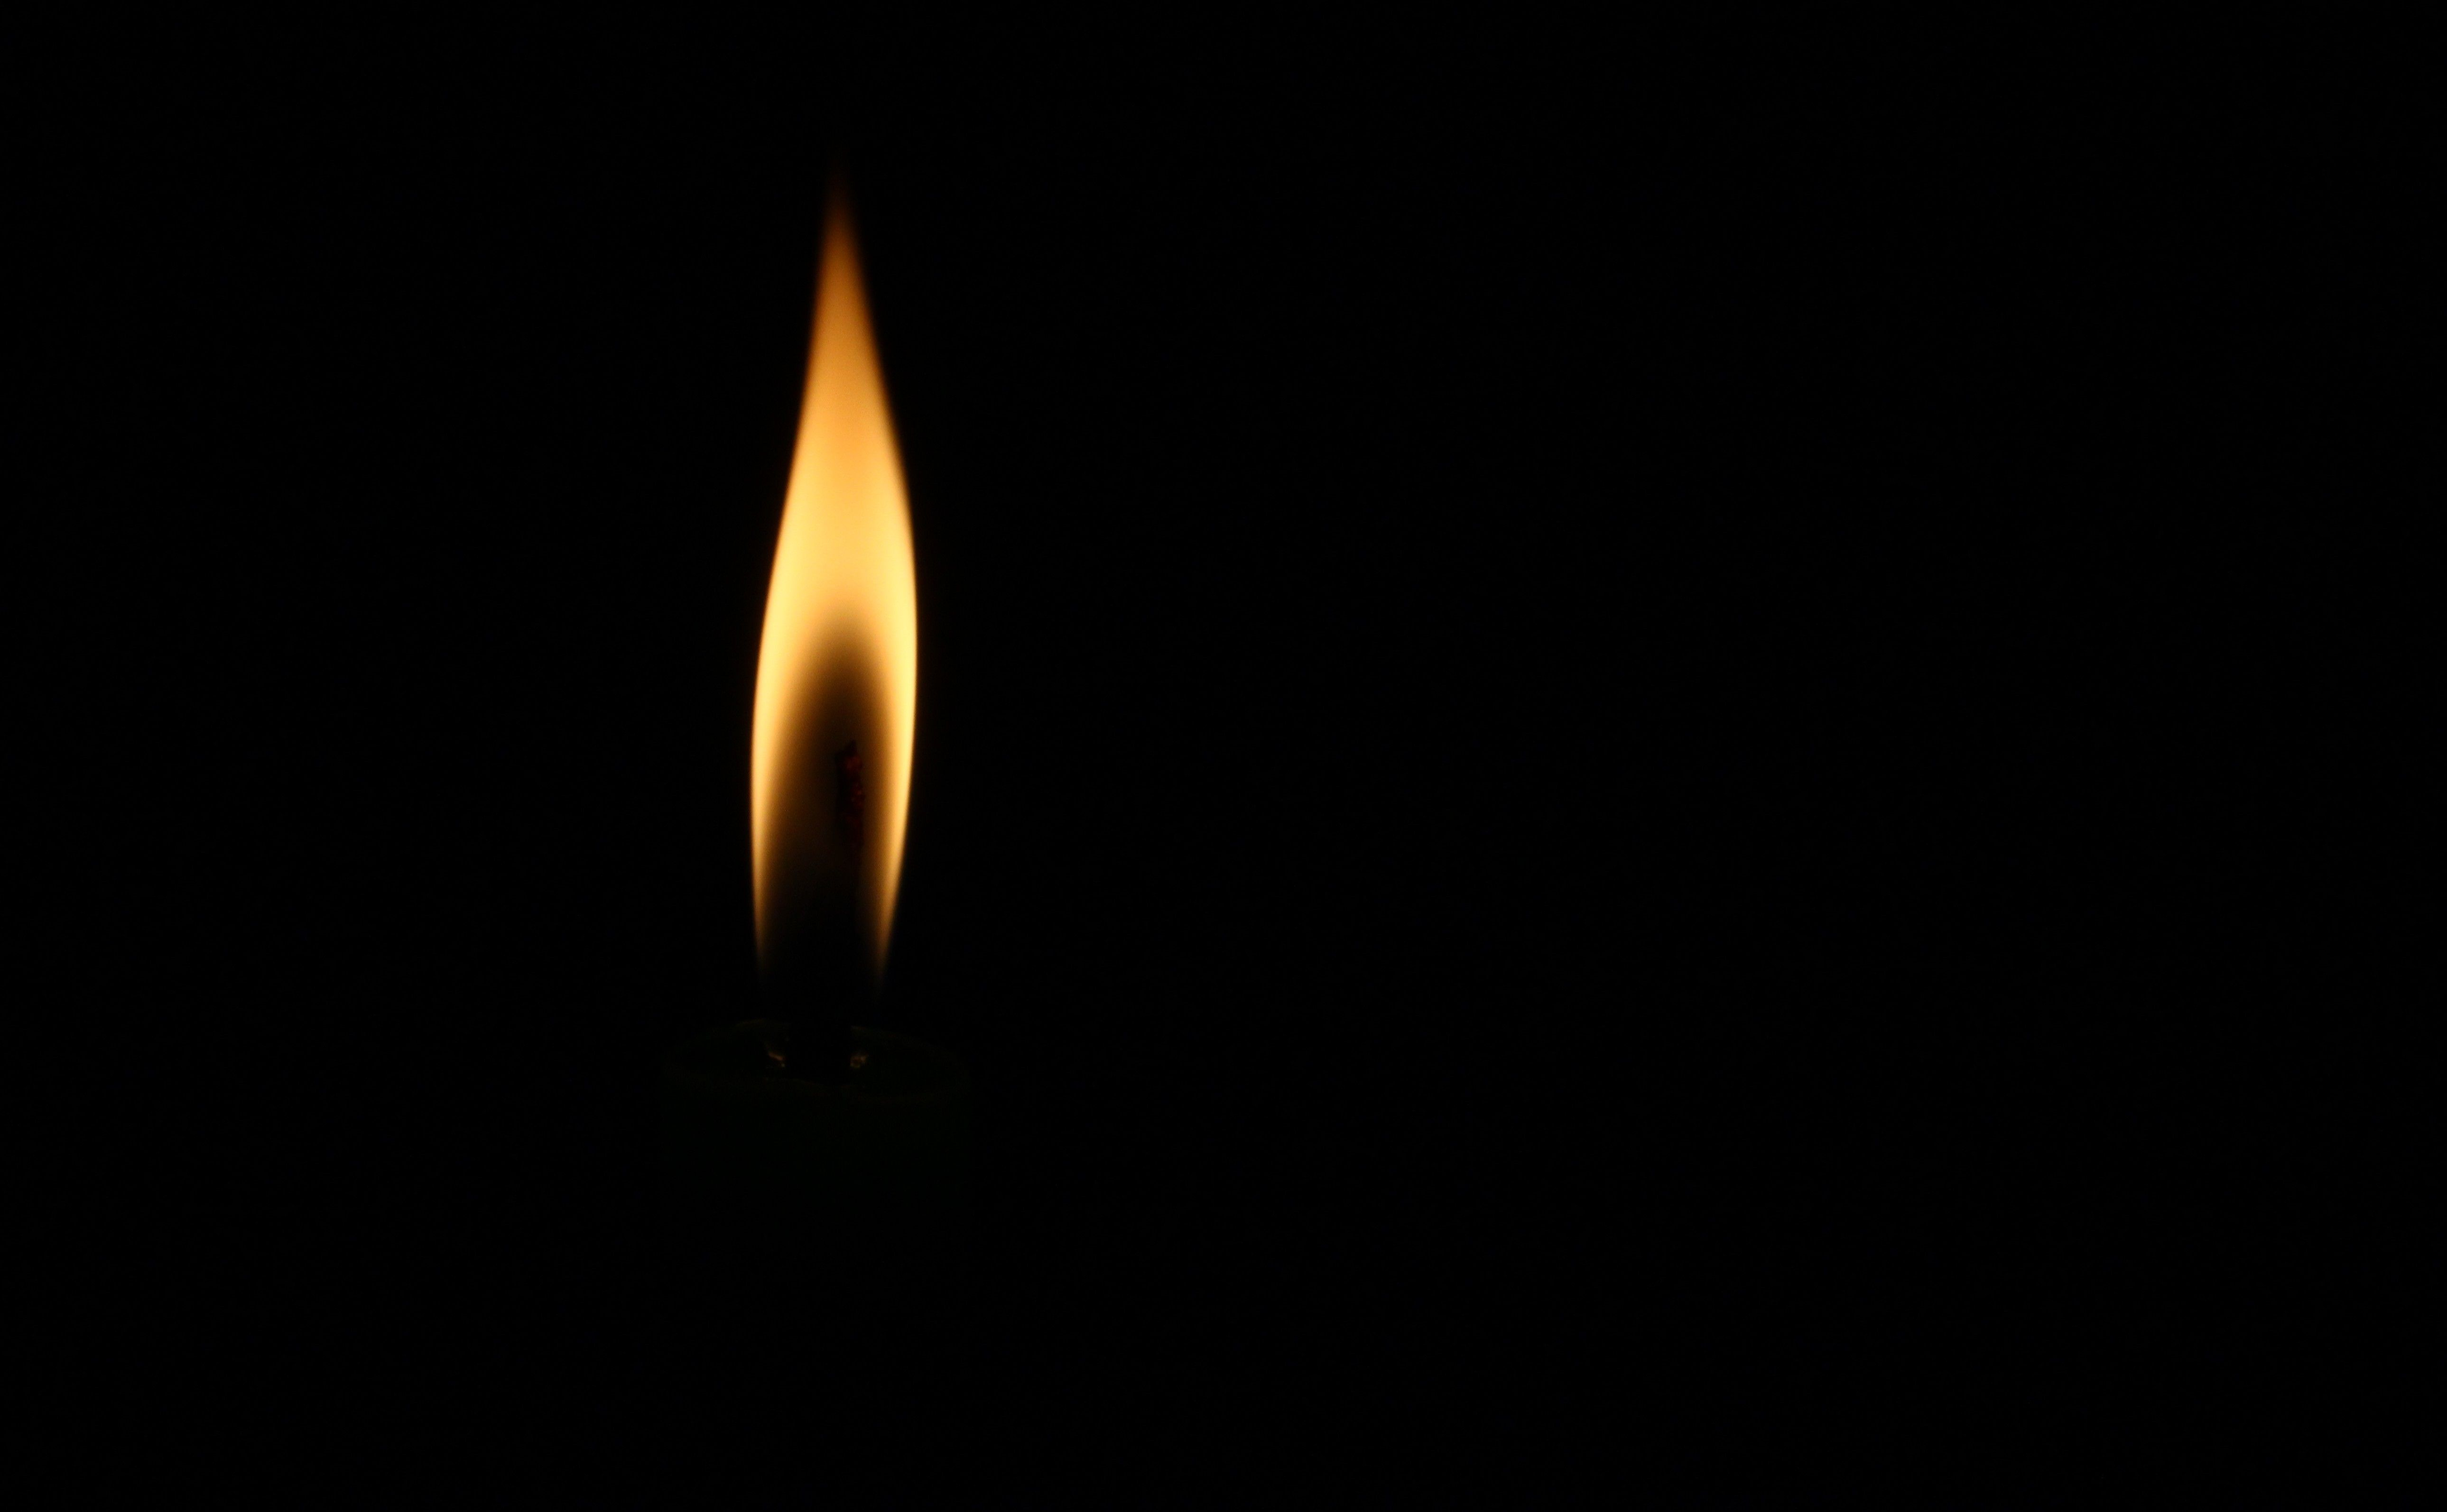 Анимация пламя свечи на прозрачном фоне